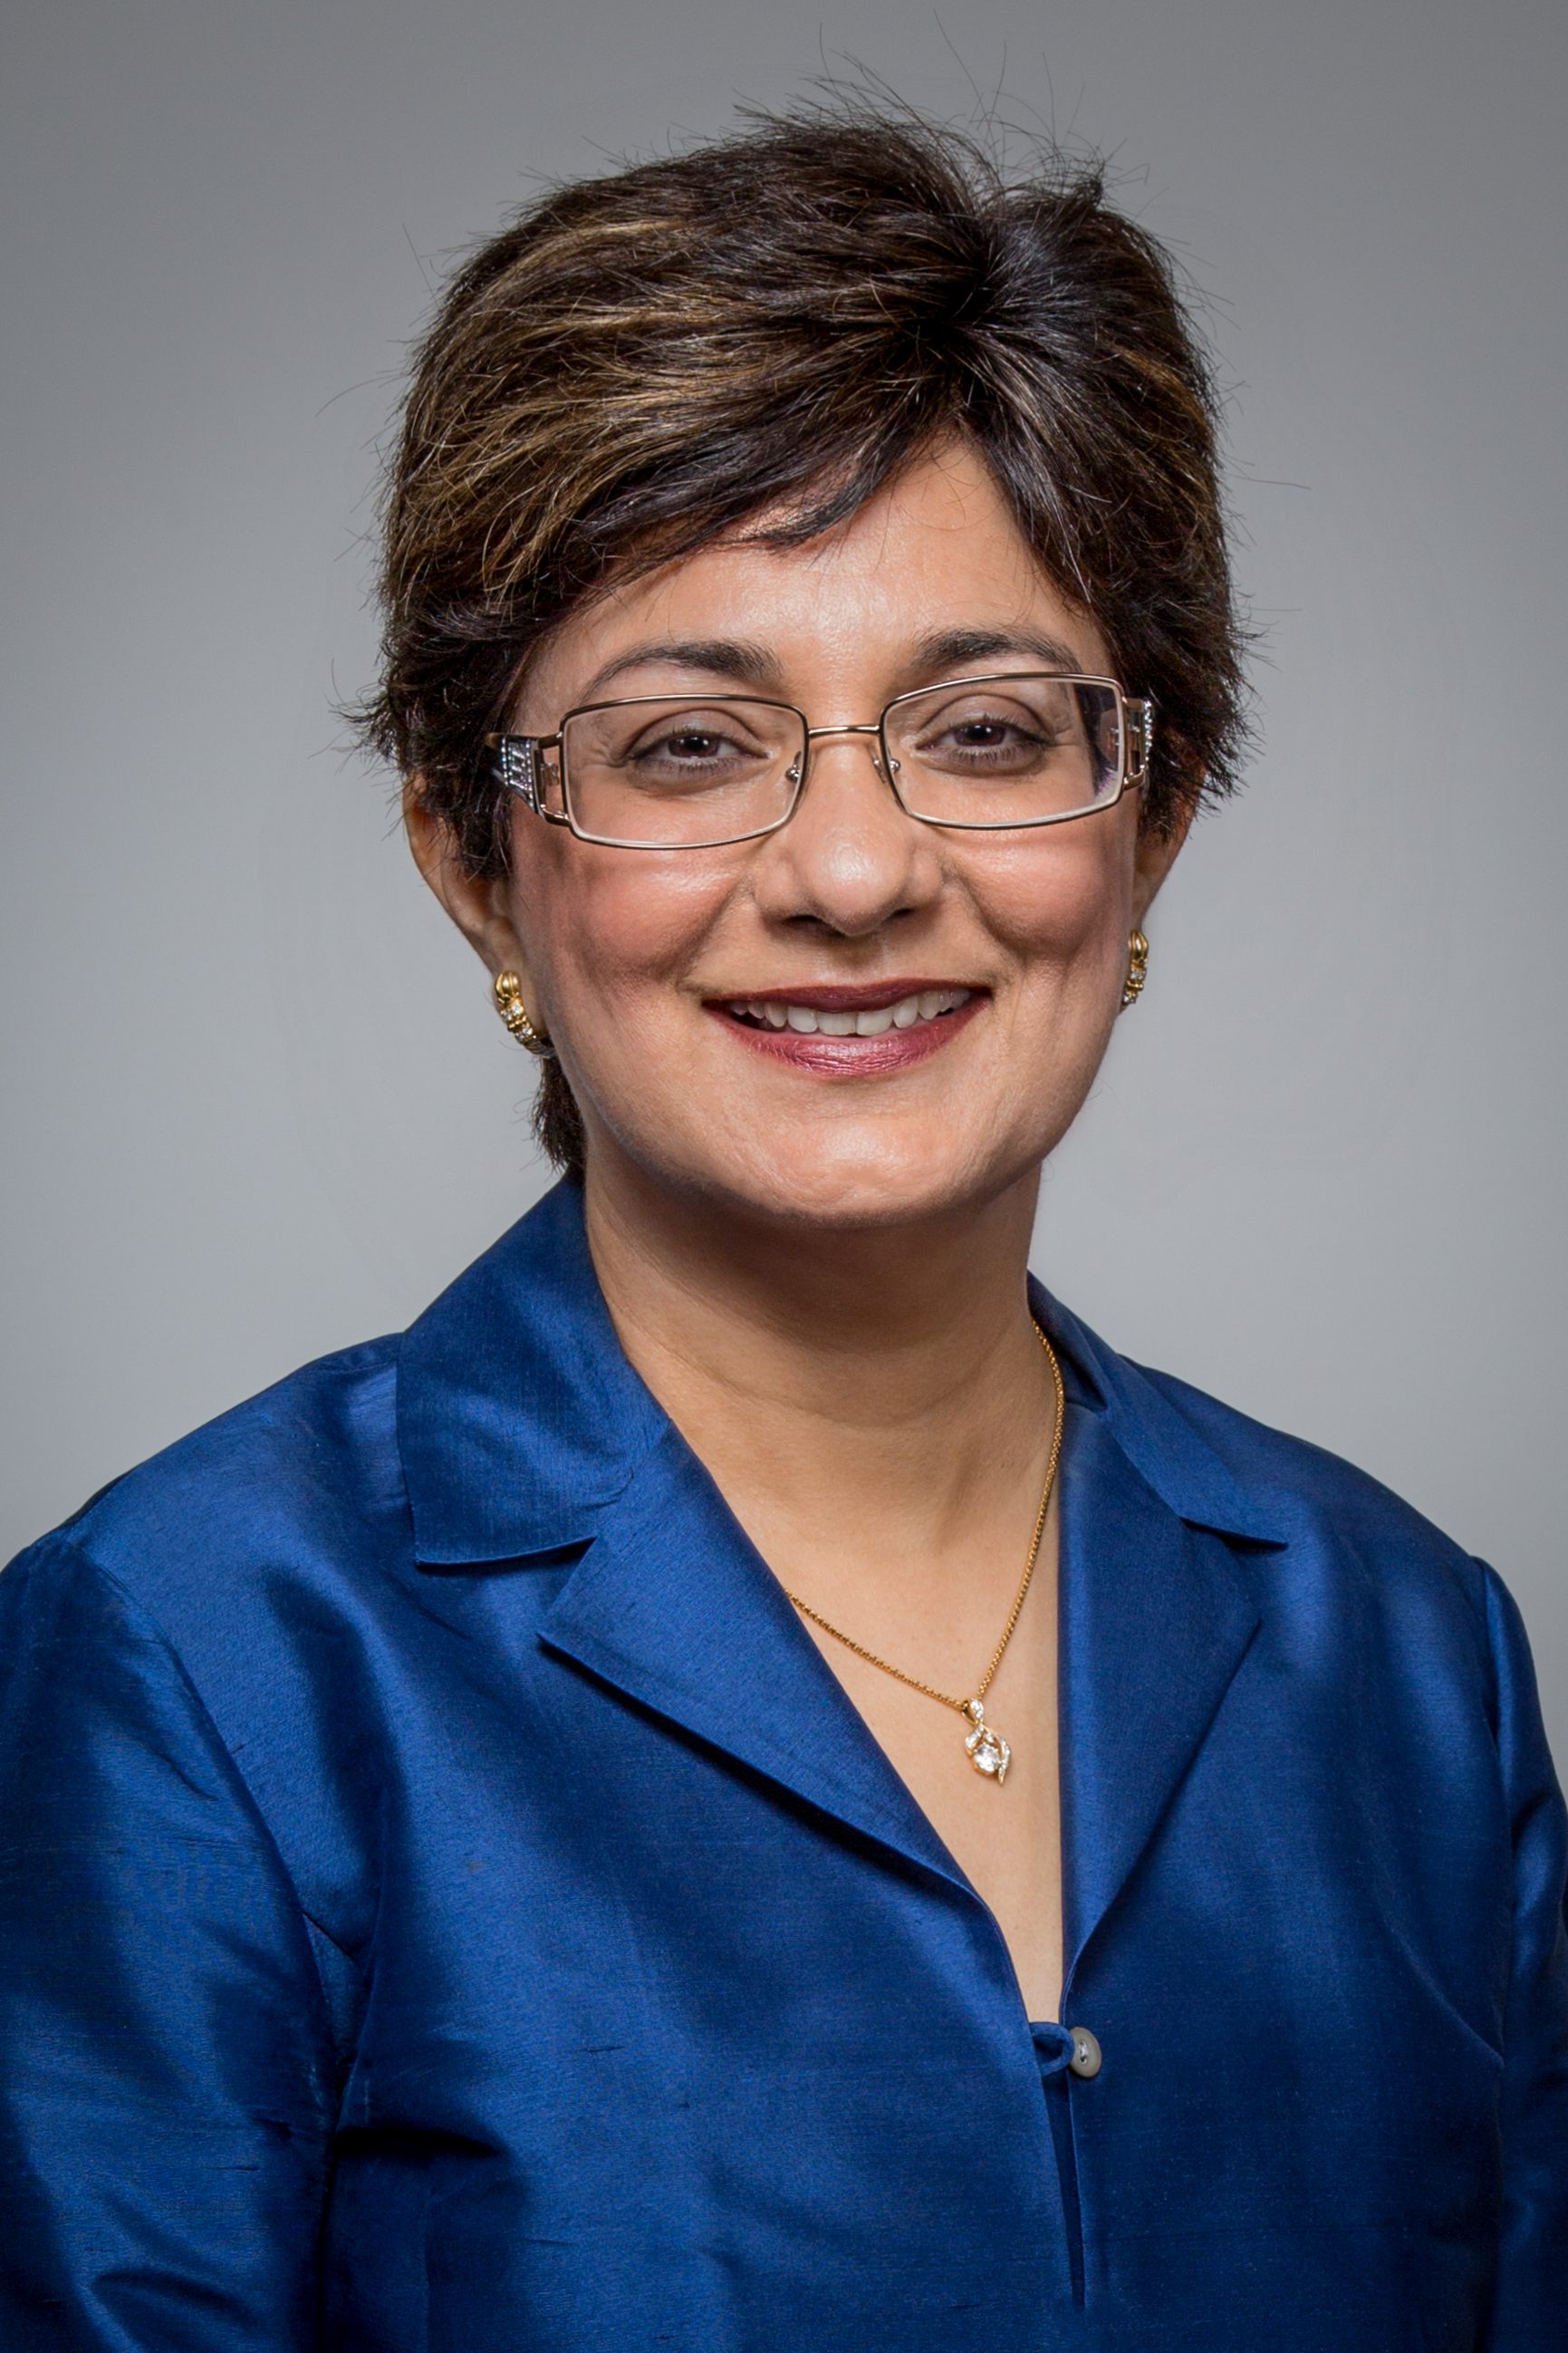 Meghna Virick Portrait